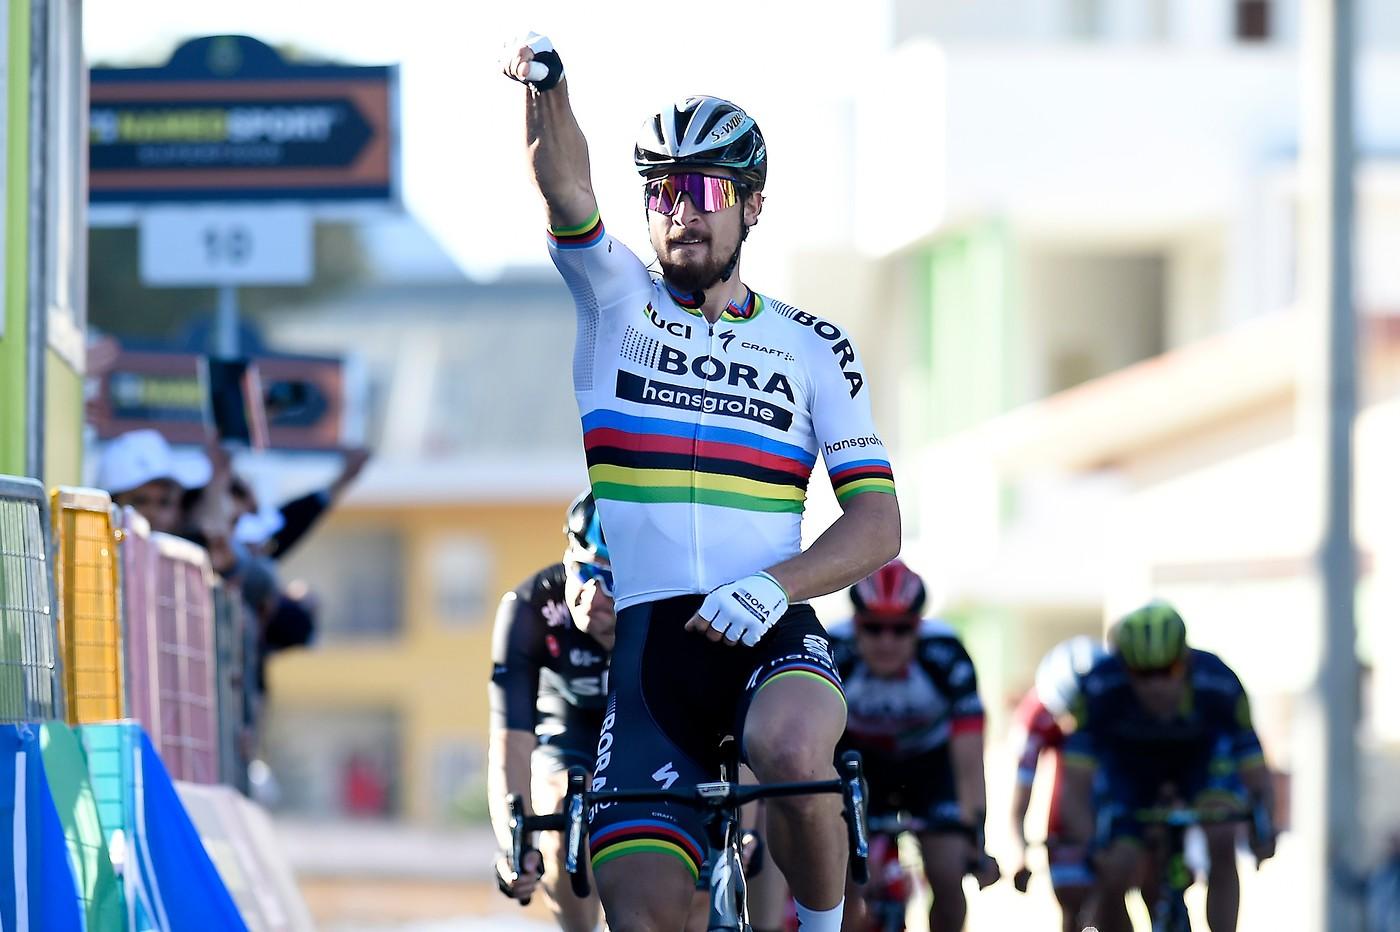 Peter Sagan Tirreno Adriatico 2017